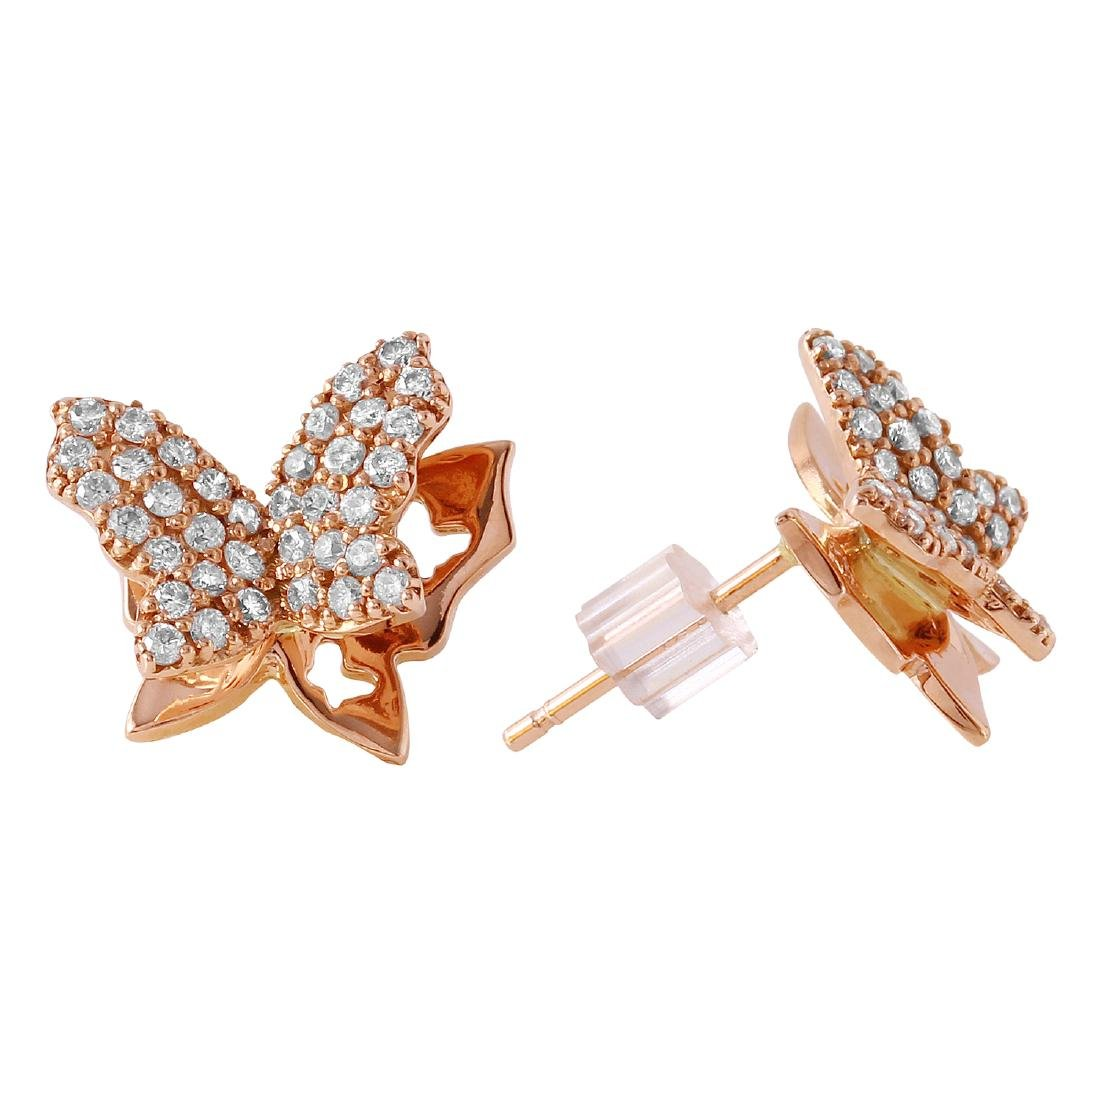 0.48 Carat Natural Diamond 18K Solid Rose Gold Earring - 2